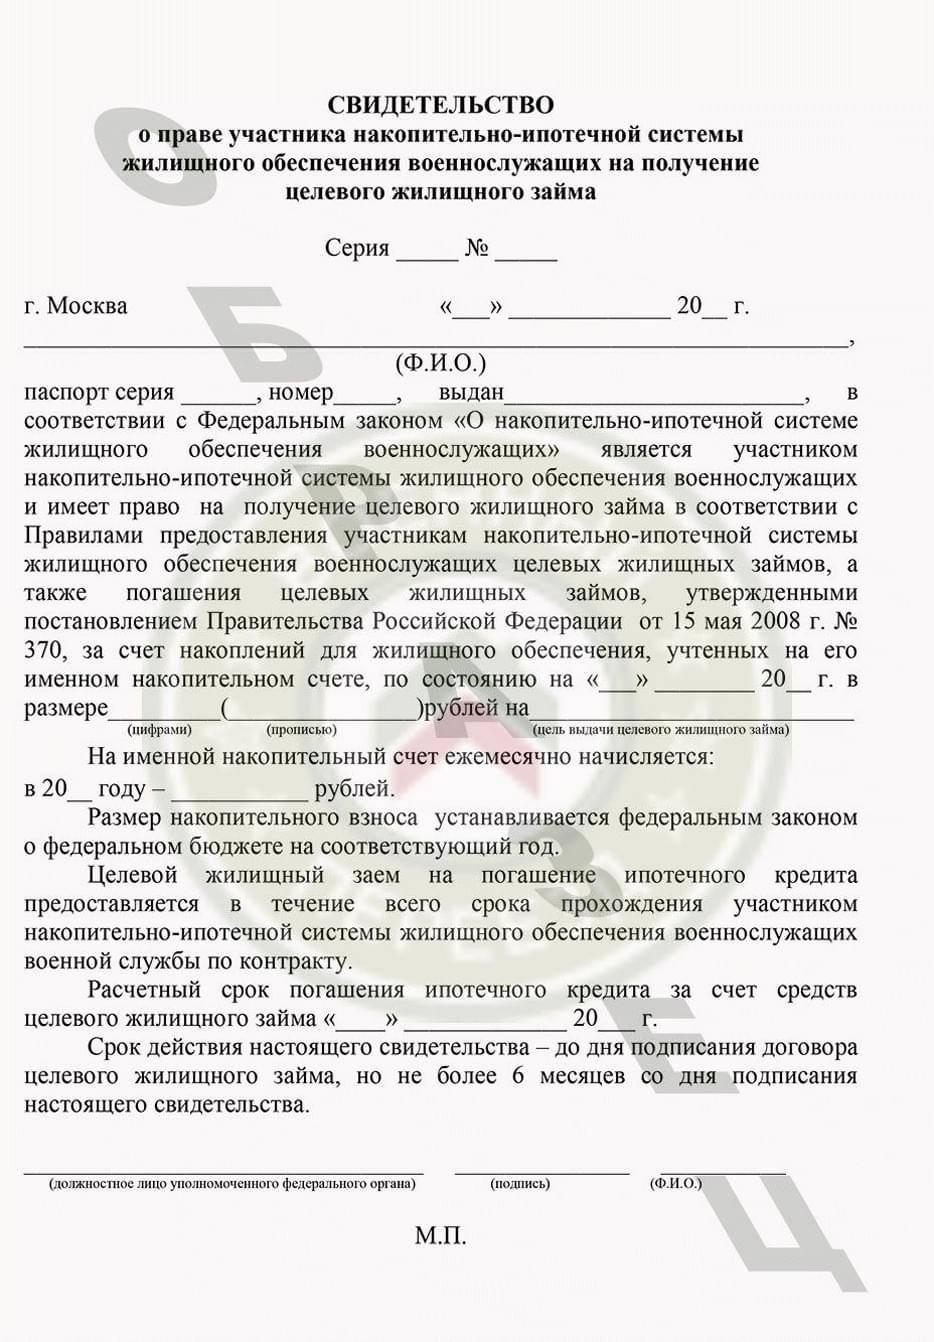 Форма рапорта на получение сертификата сертификация и лицензирование в сфере т и ттмо